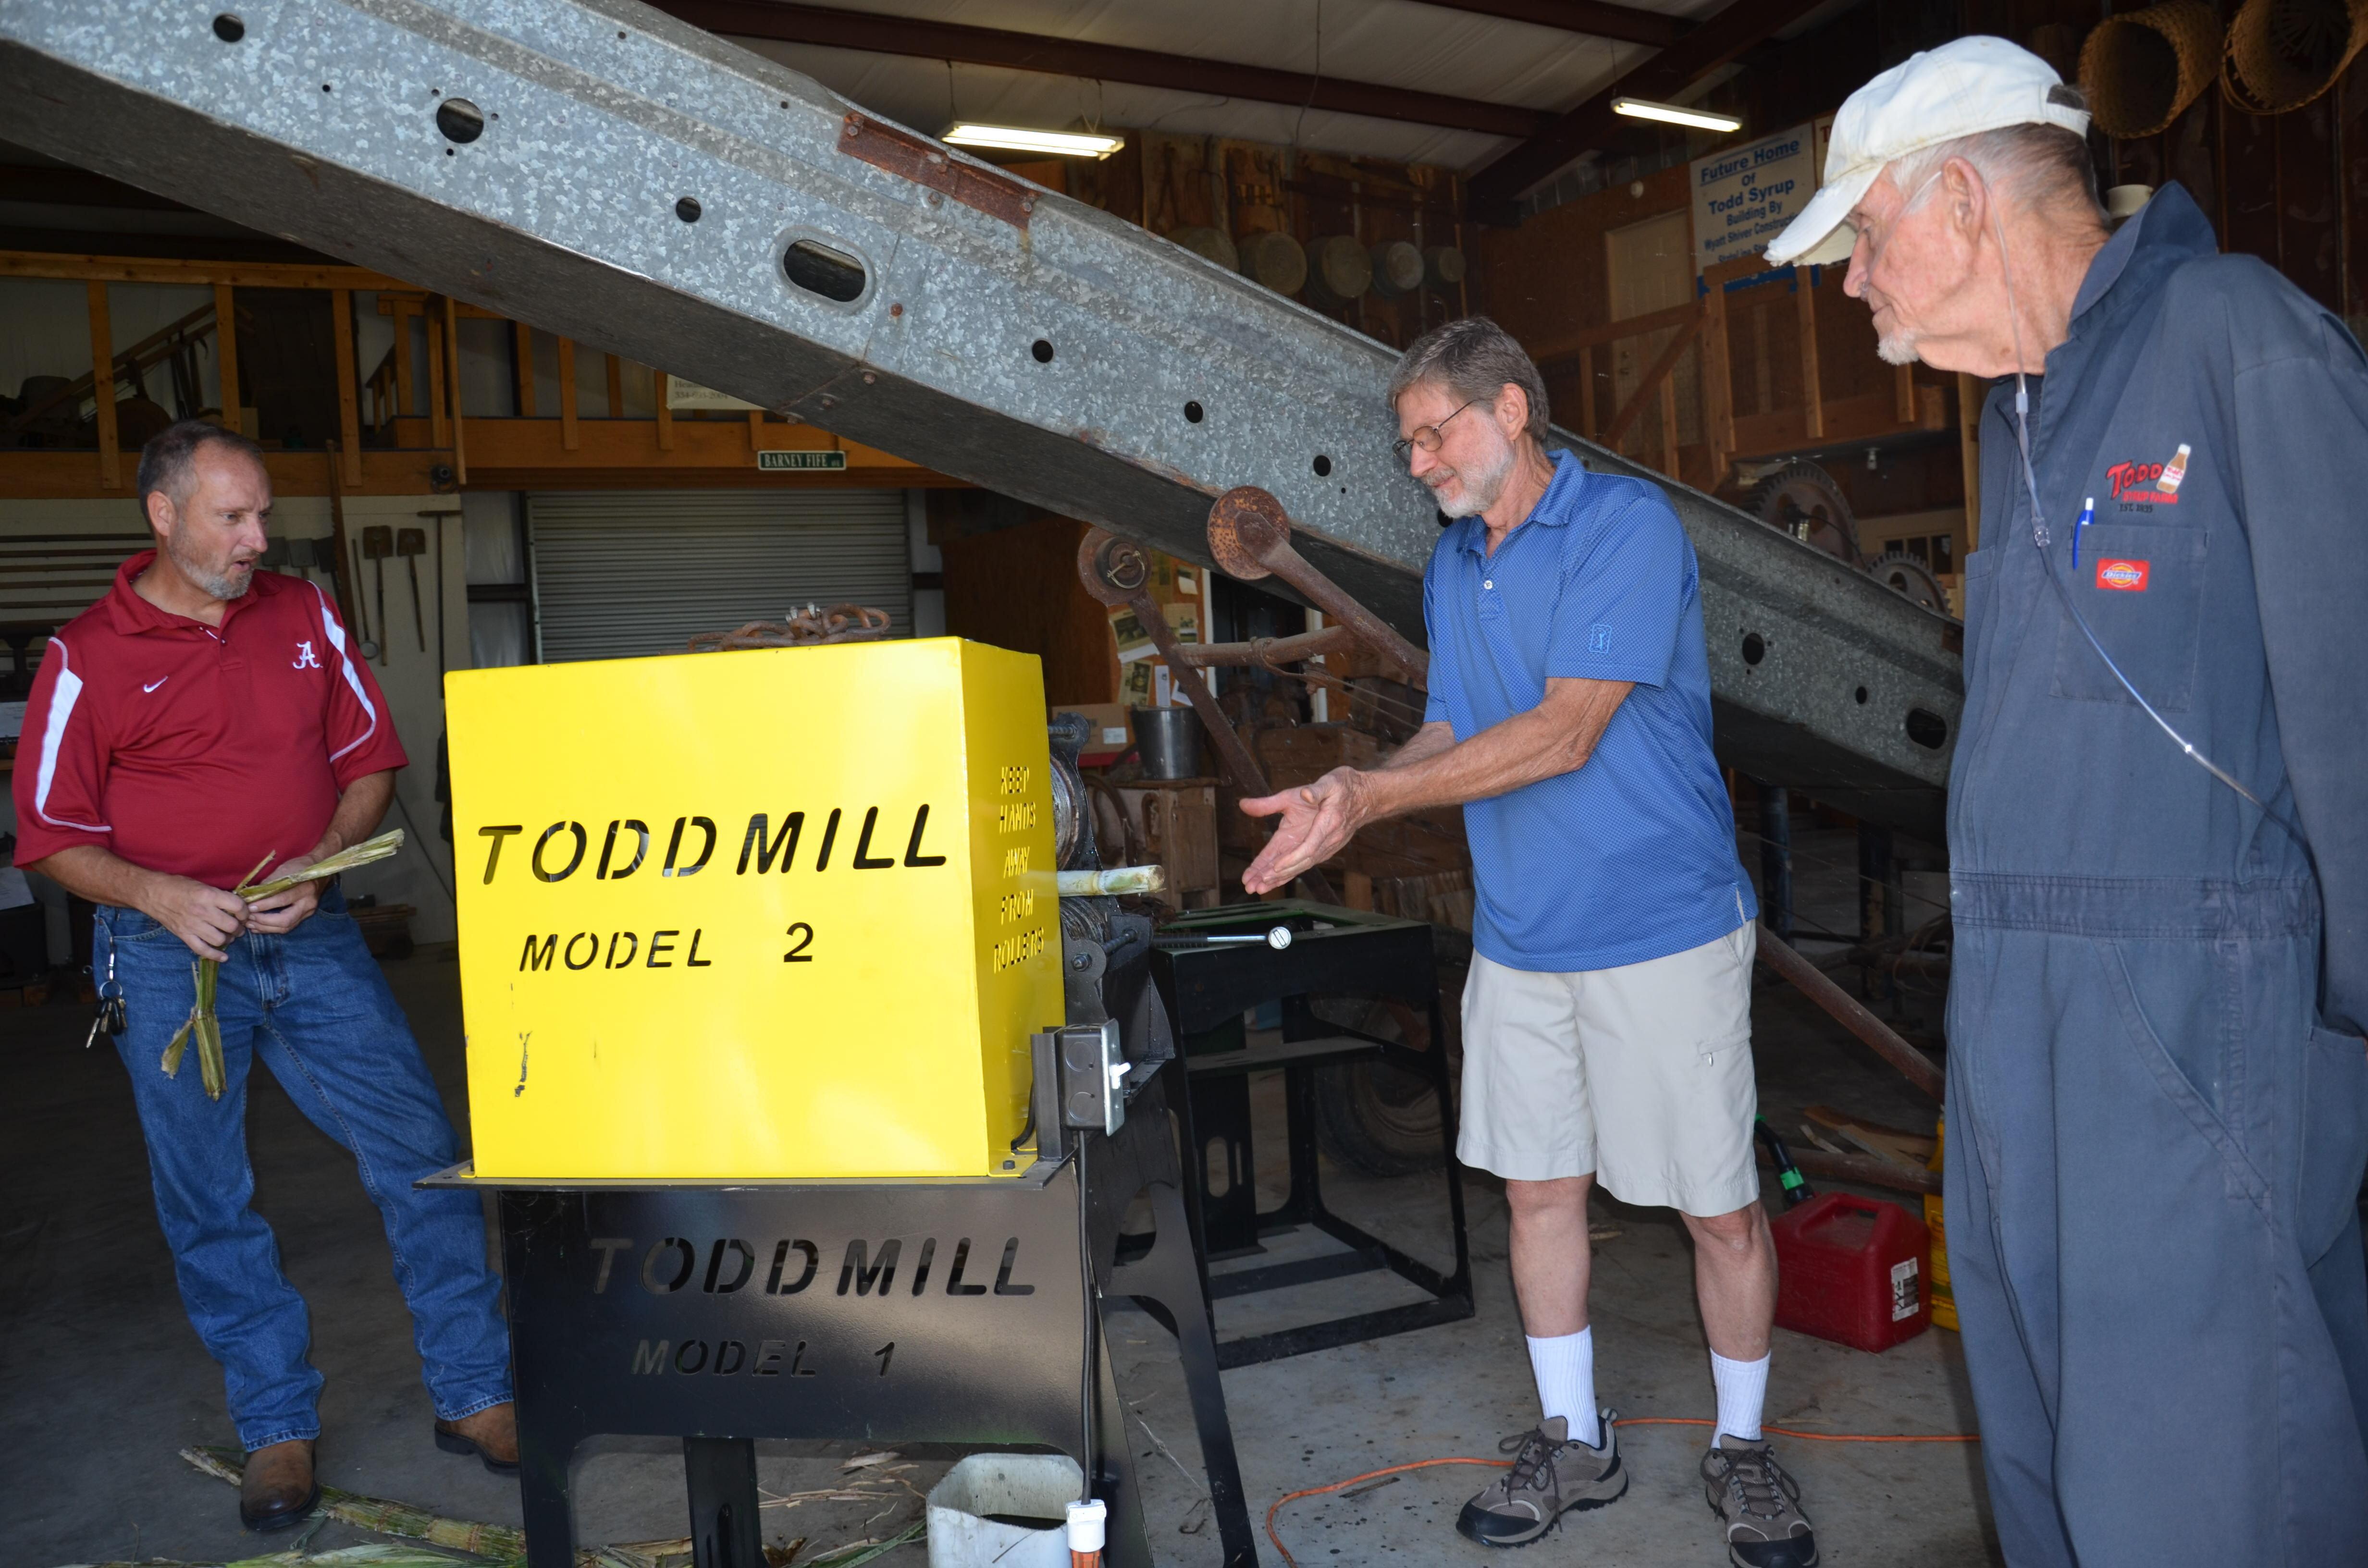 Todd Mill modernizes sugar cane production